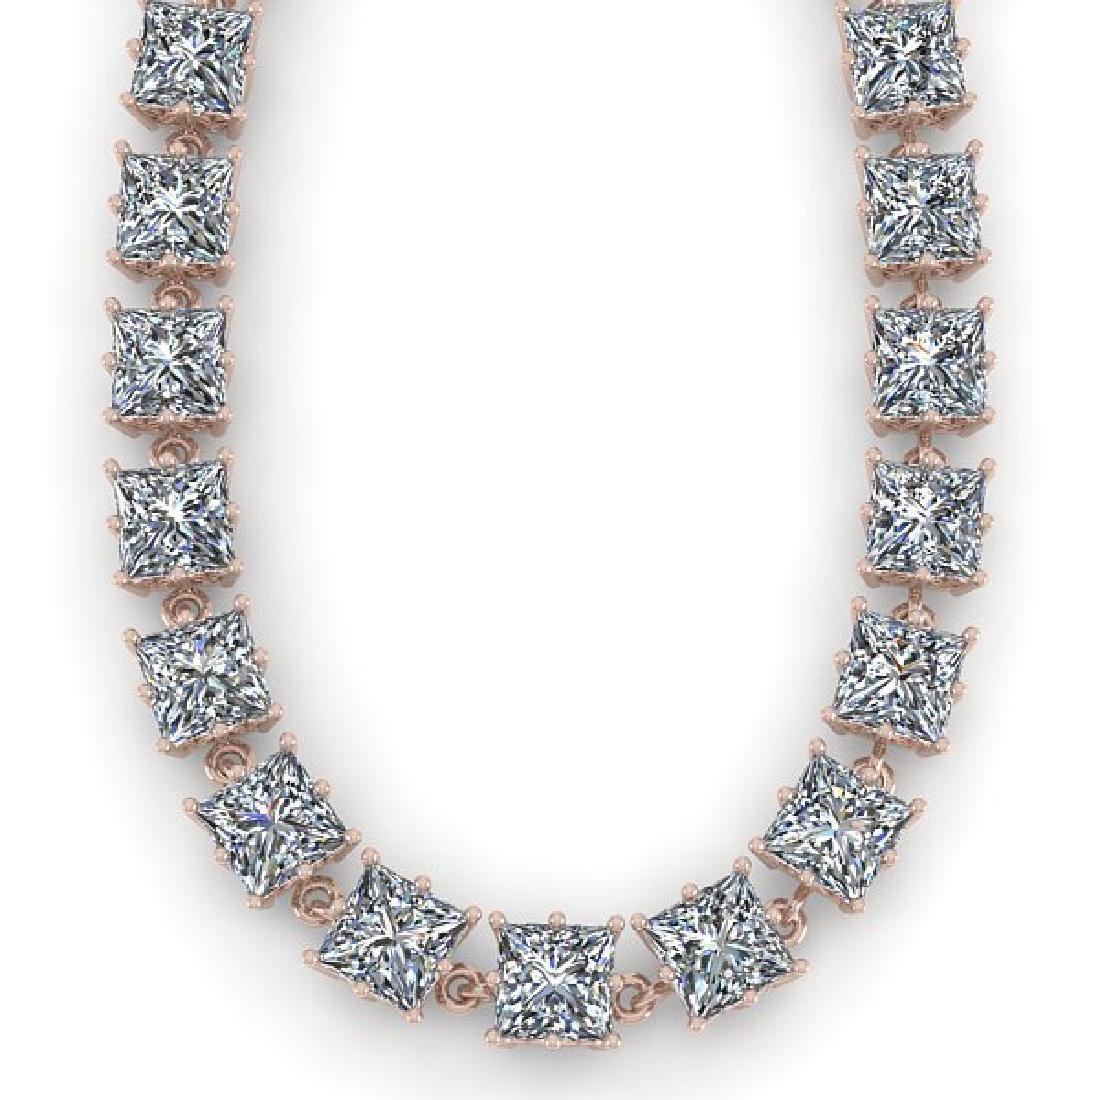 40 CTW Princess SI Diamond Necklace 18K Rose Gold - 2